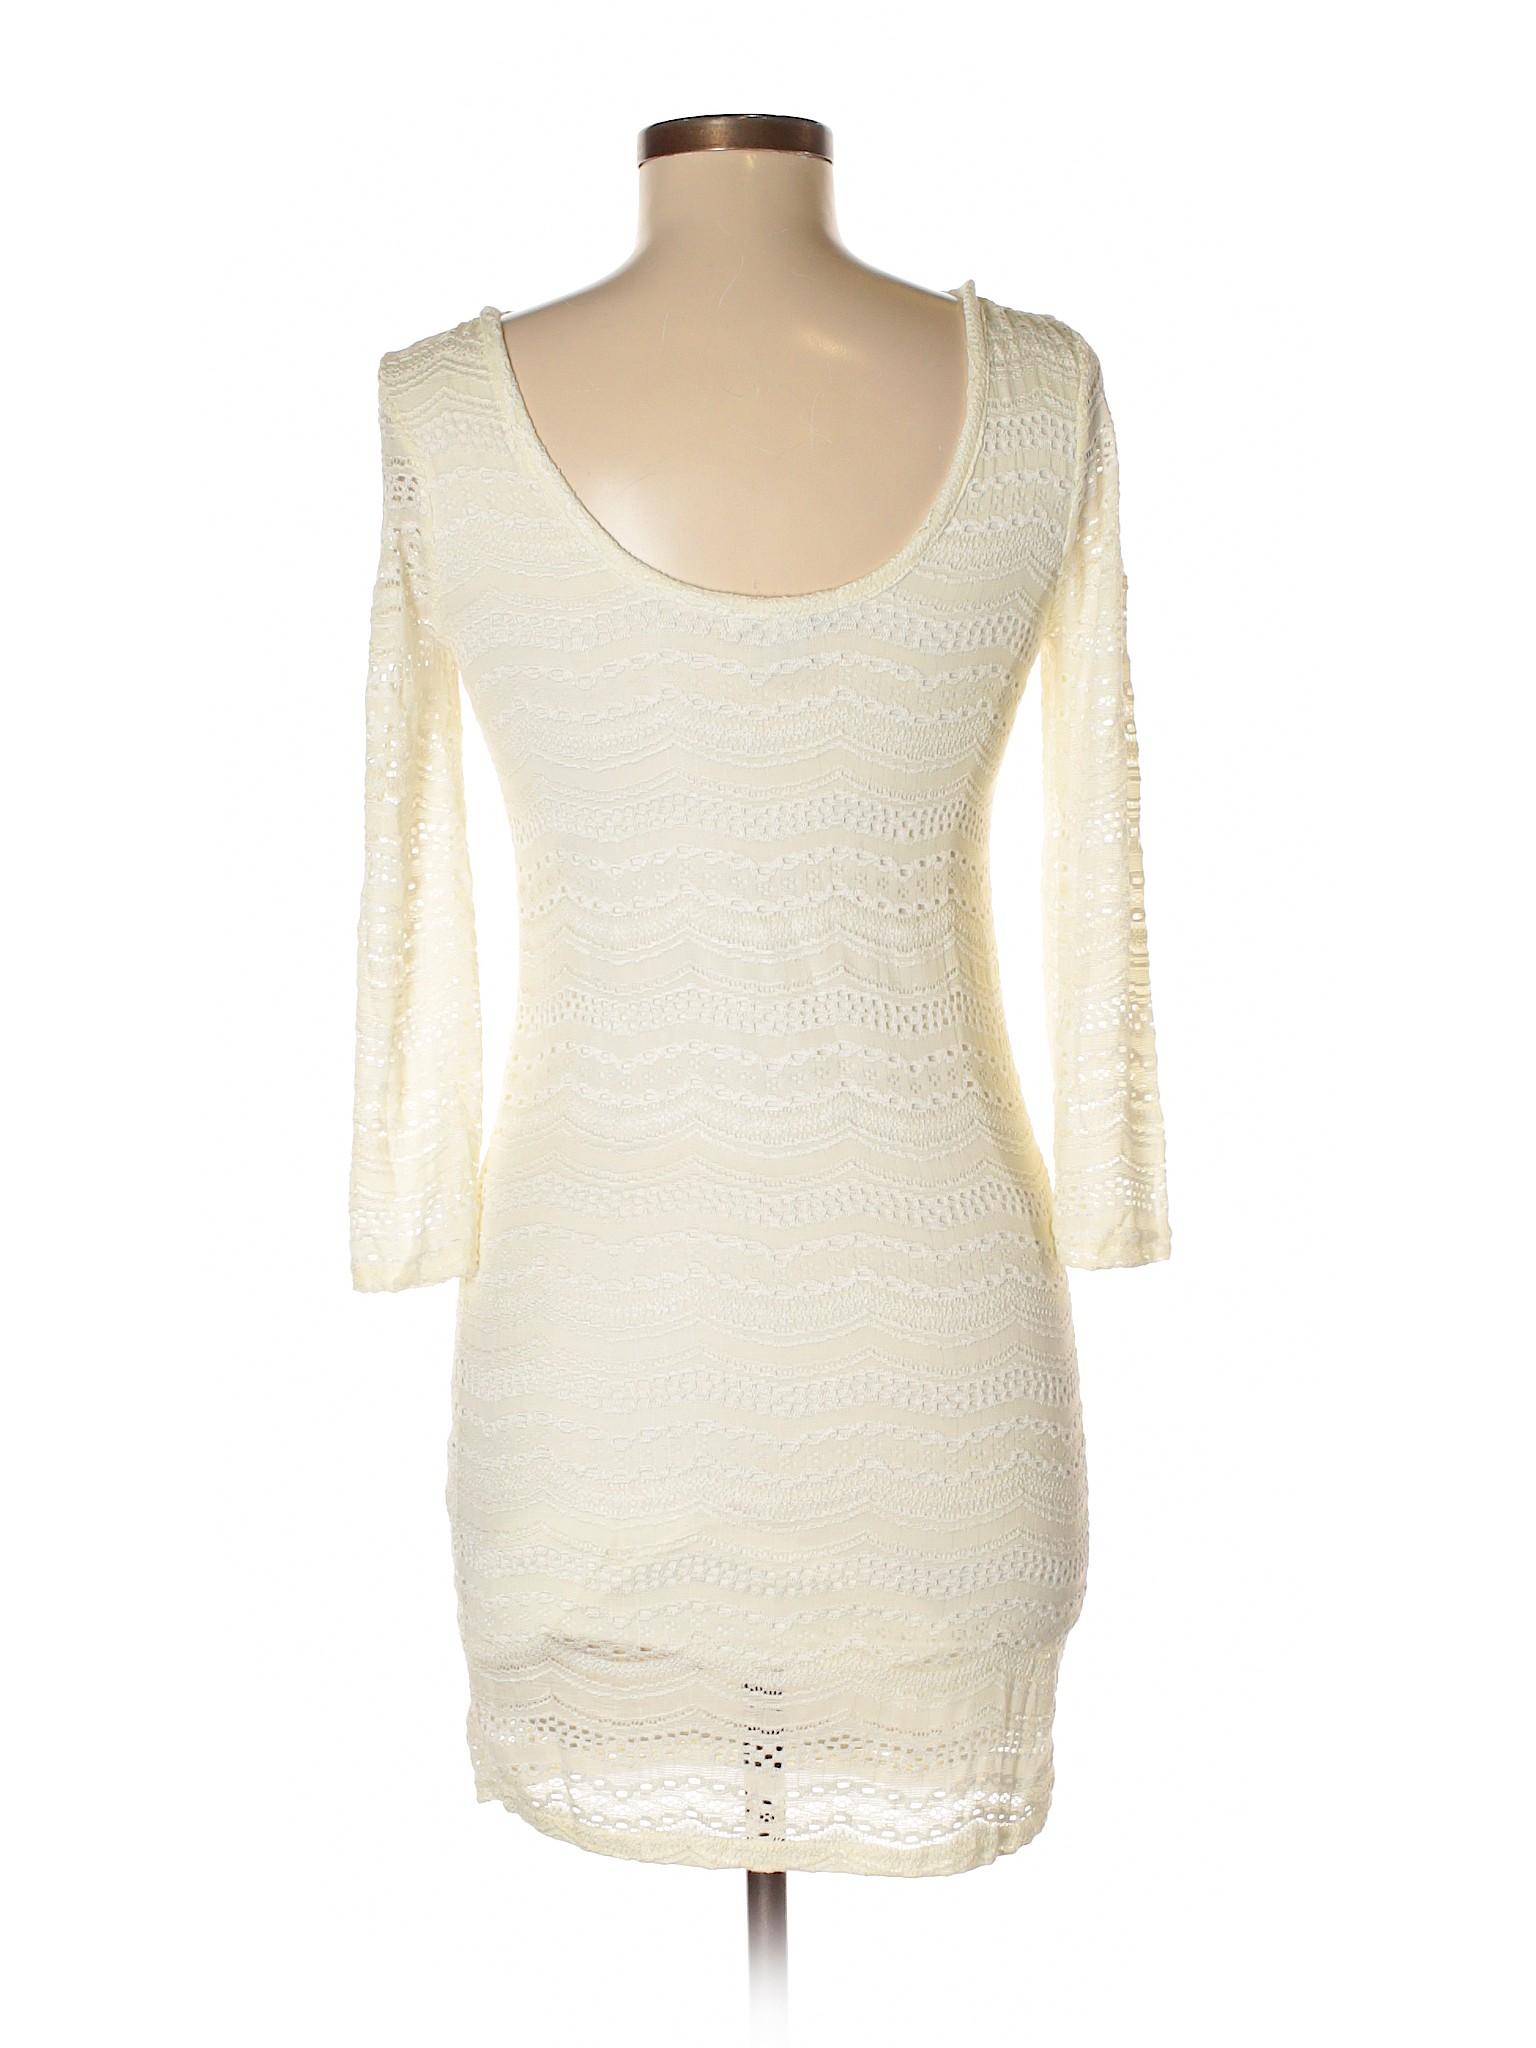 Boutique Casual On winter Dress Cotton 4x4qFaUw